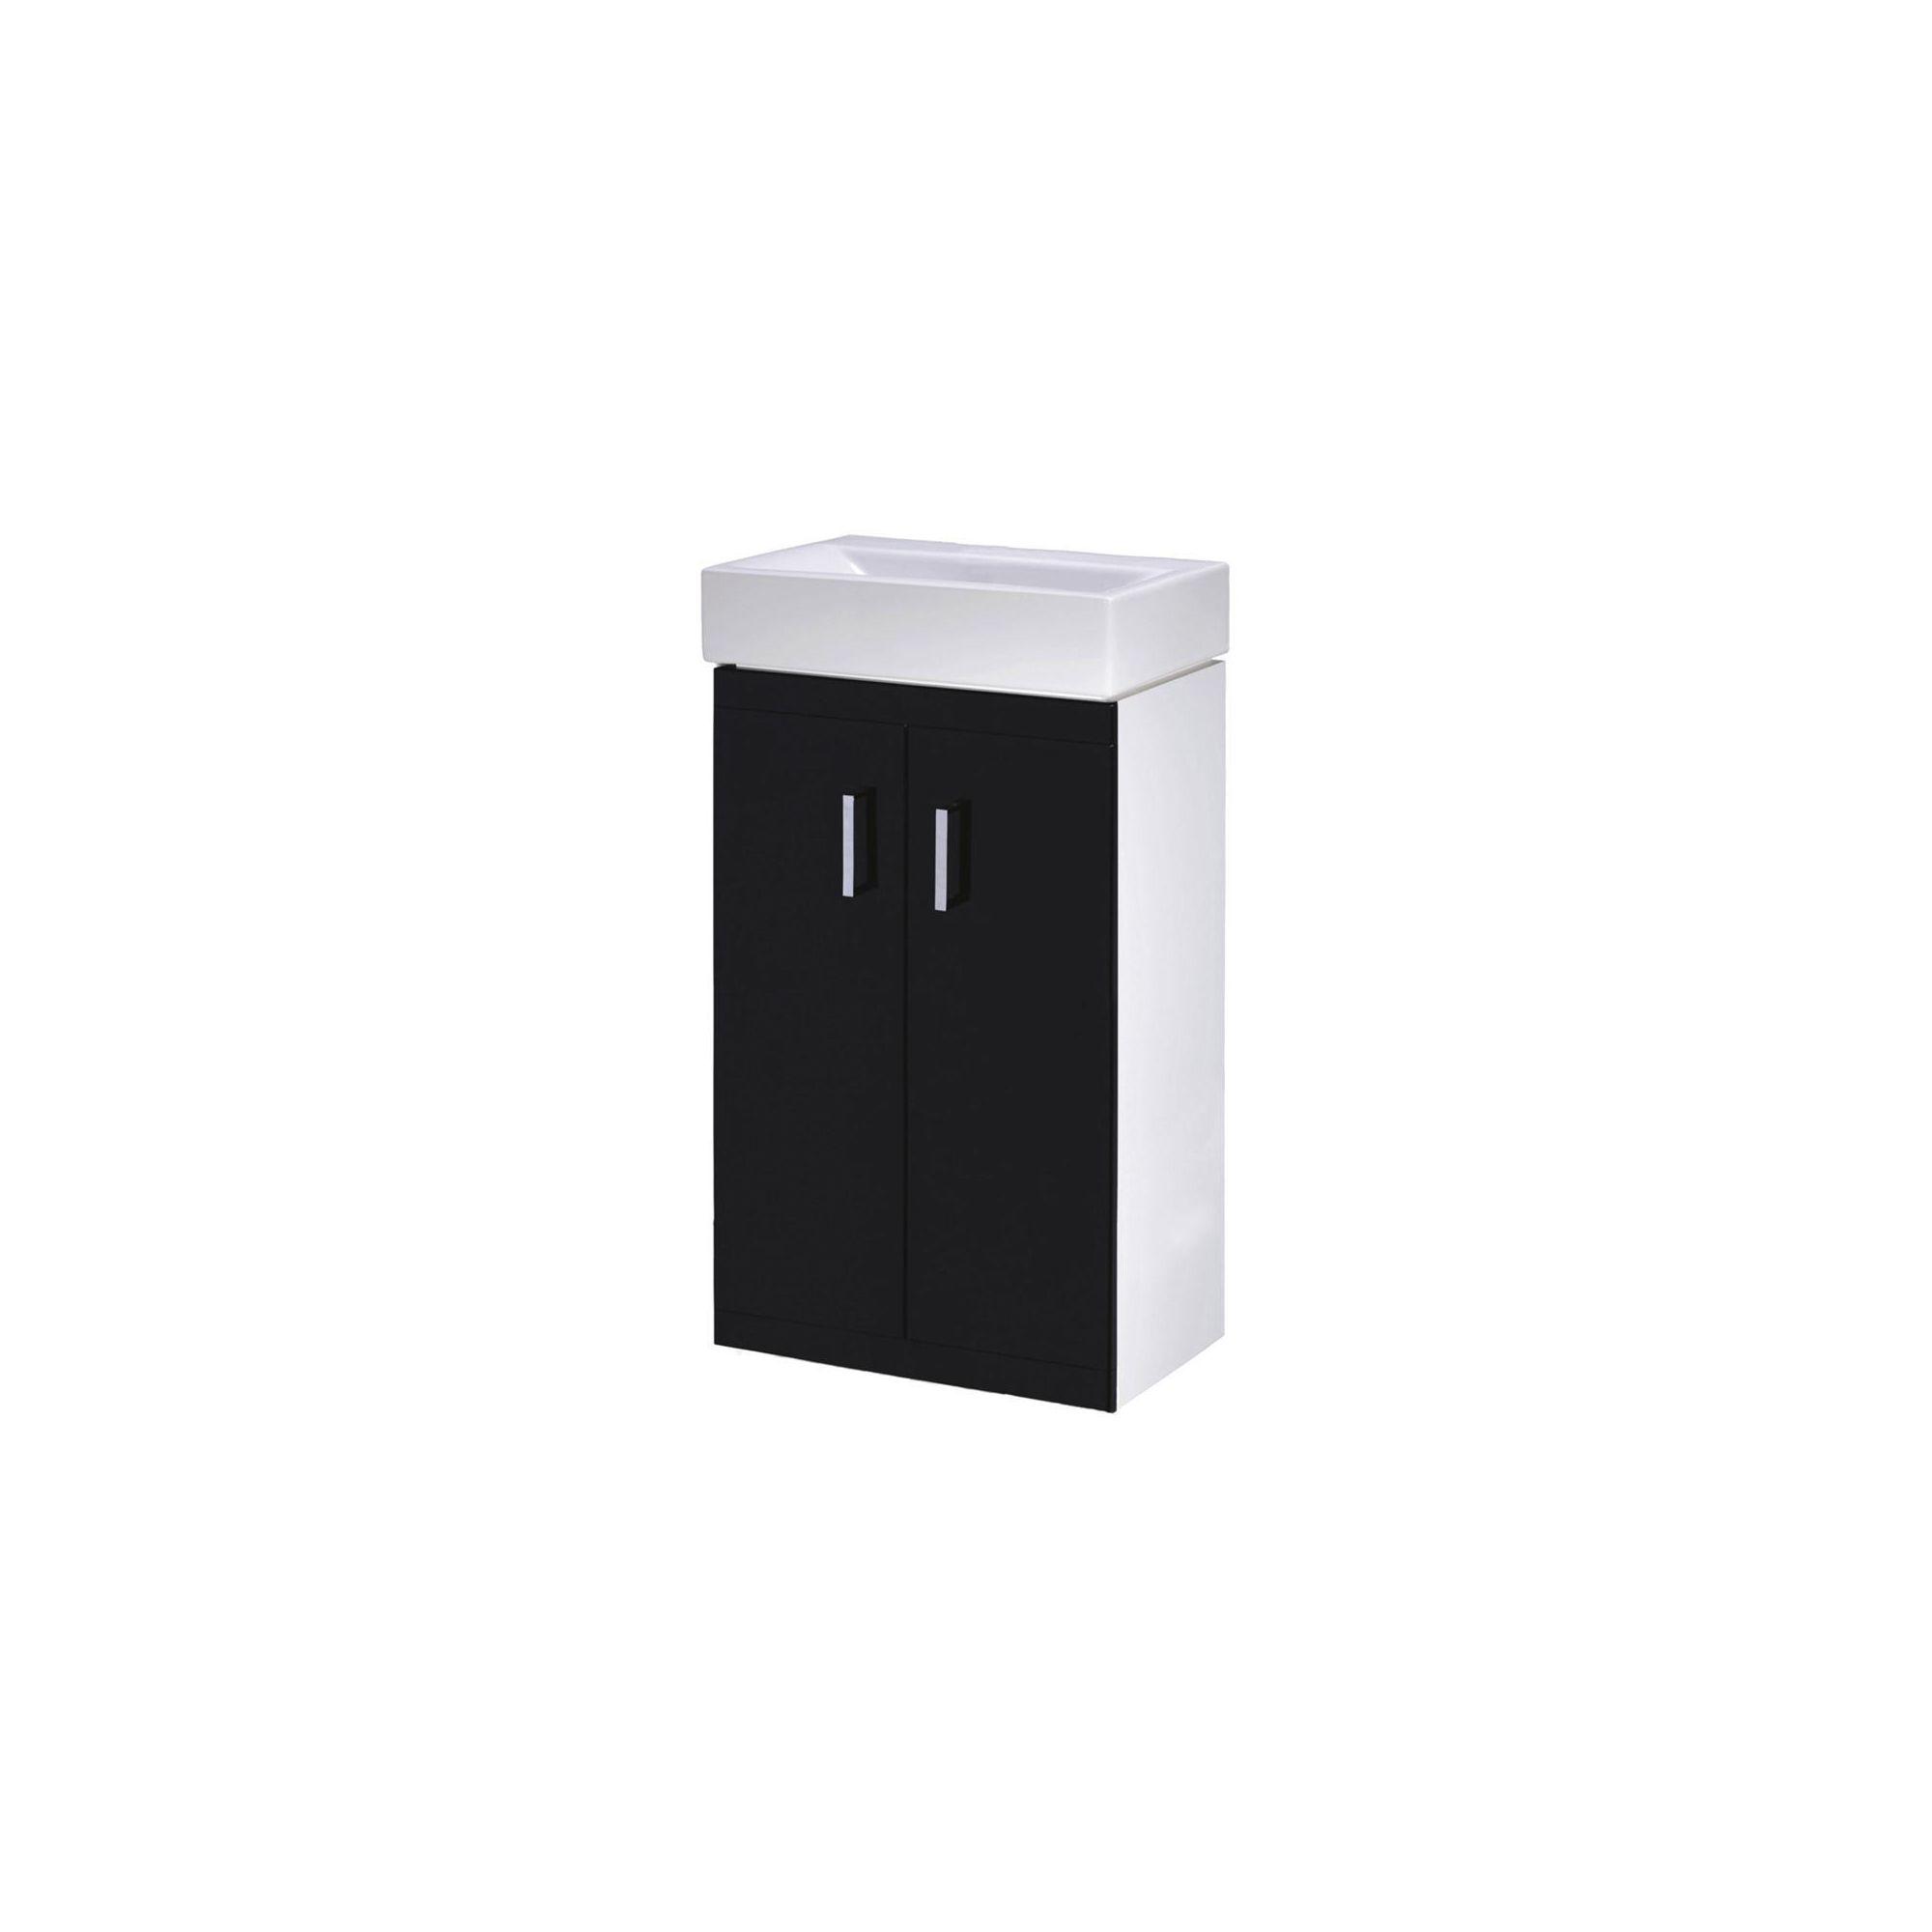 Premier Checkers Floor Standing Basin Vanity Unit Black and White 450mm Deep